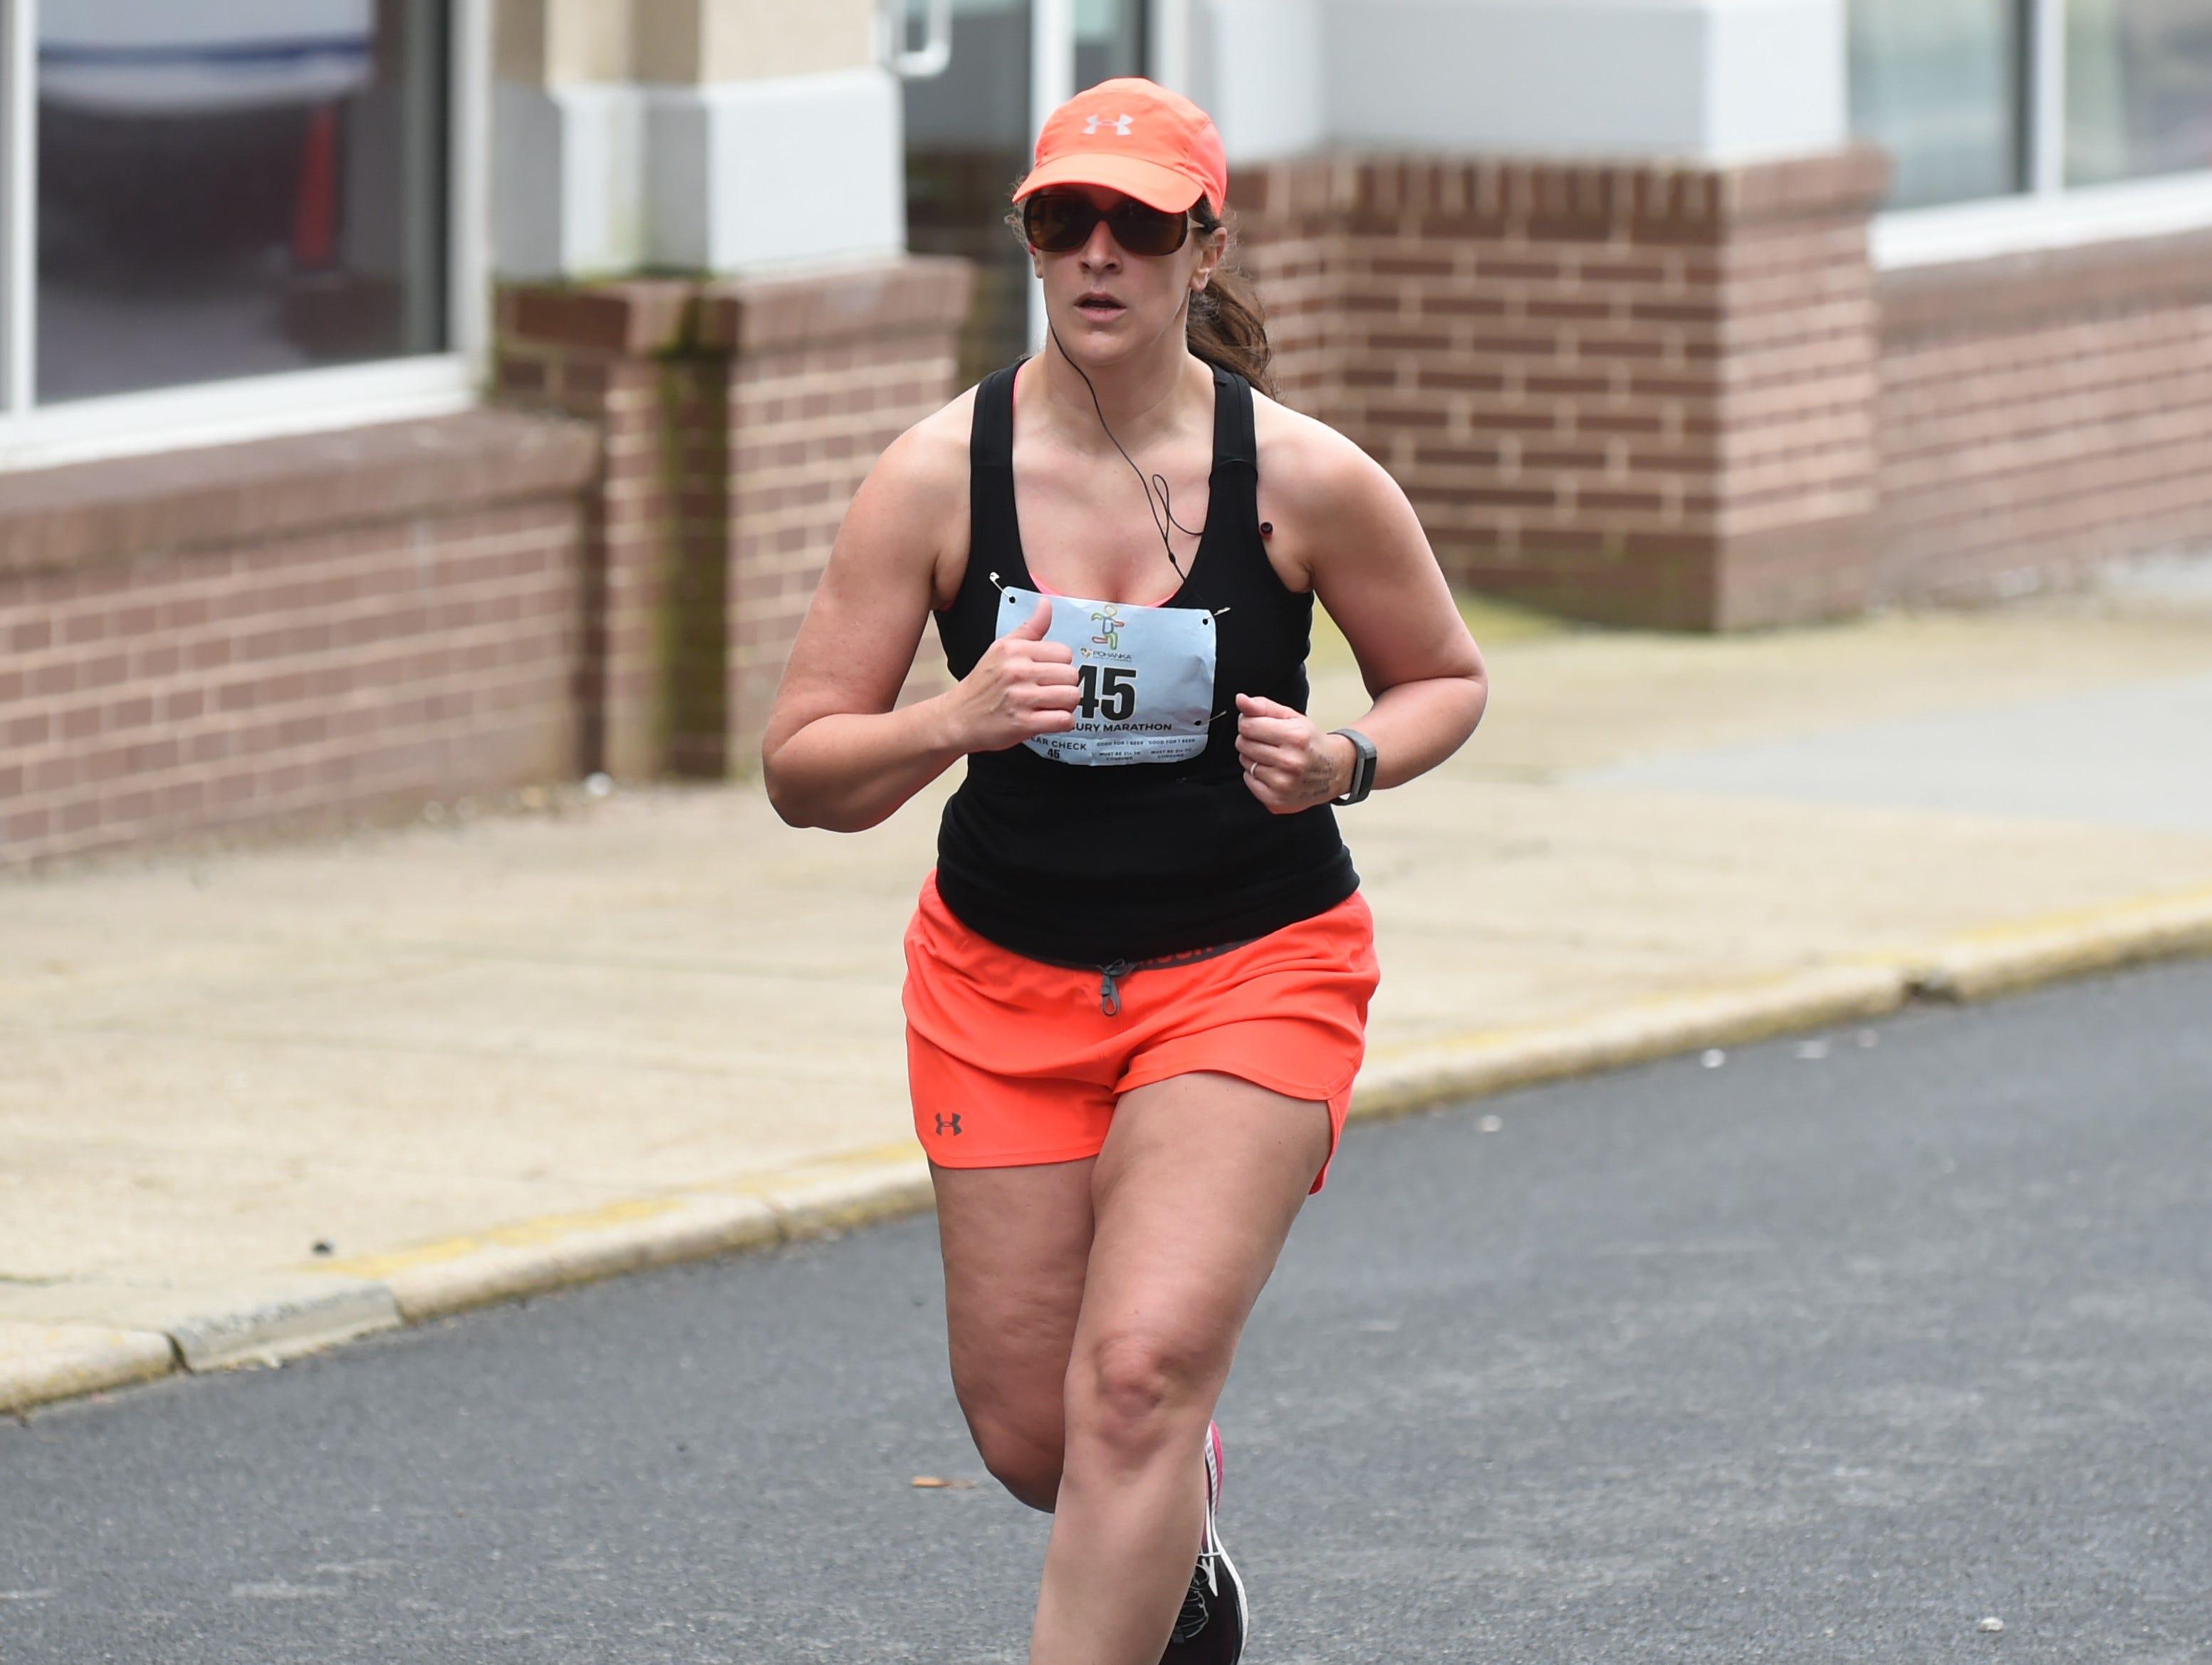 Sarah Guy heads for the finish line at the 2nd Salisbury Marathon/ Half Marathon/ 5k on Saturday, April 6, 2019.